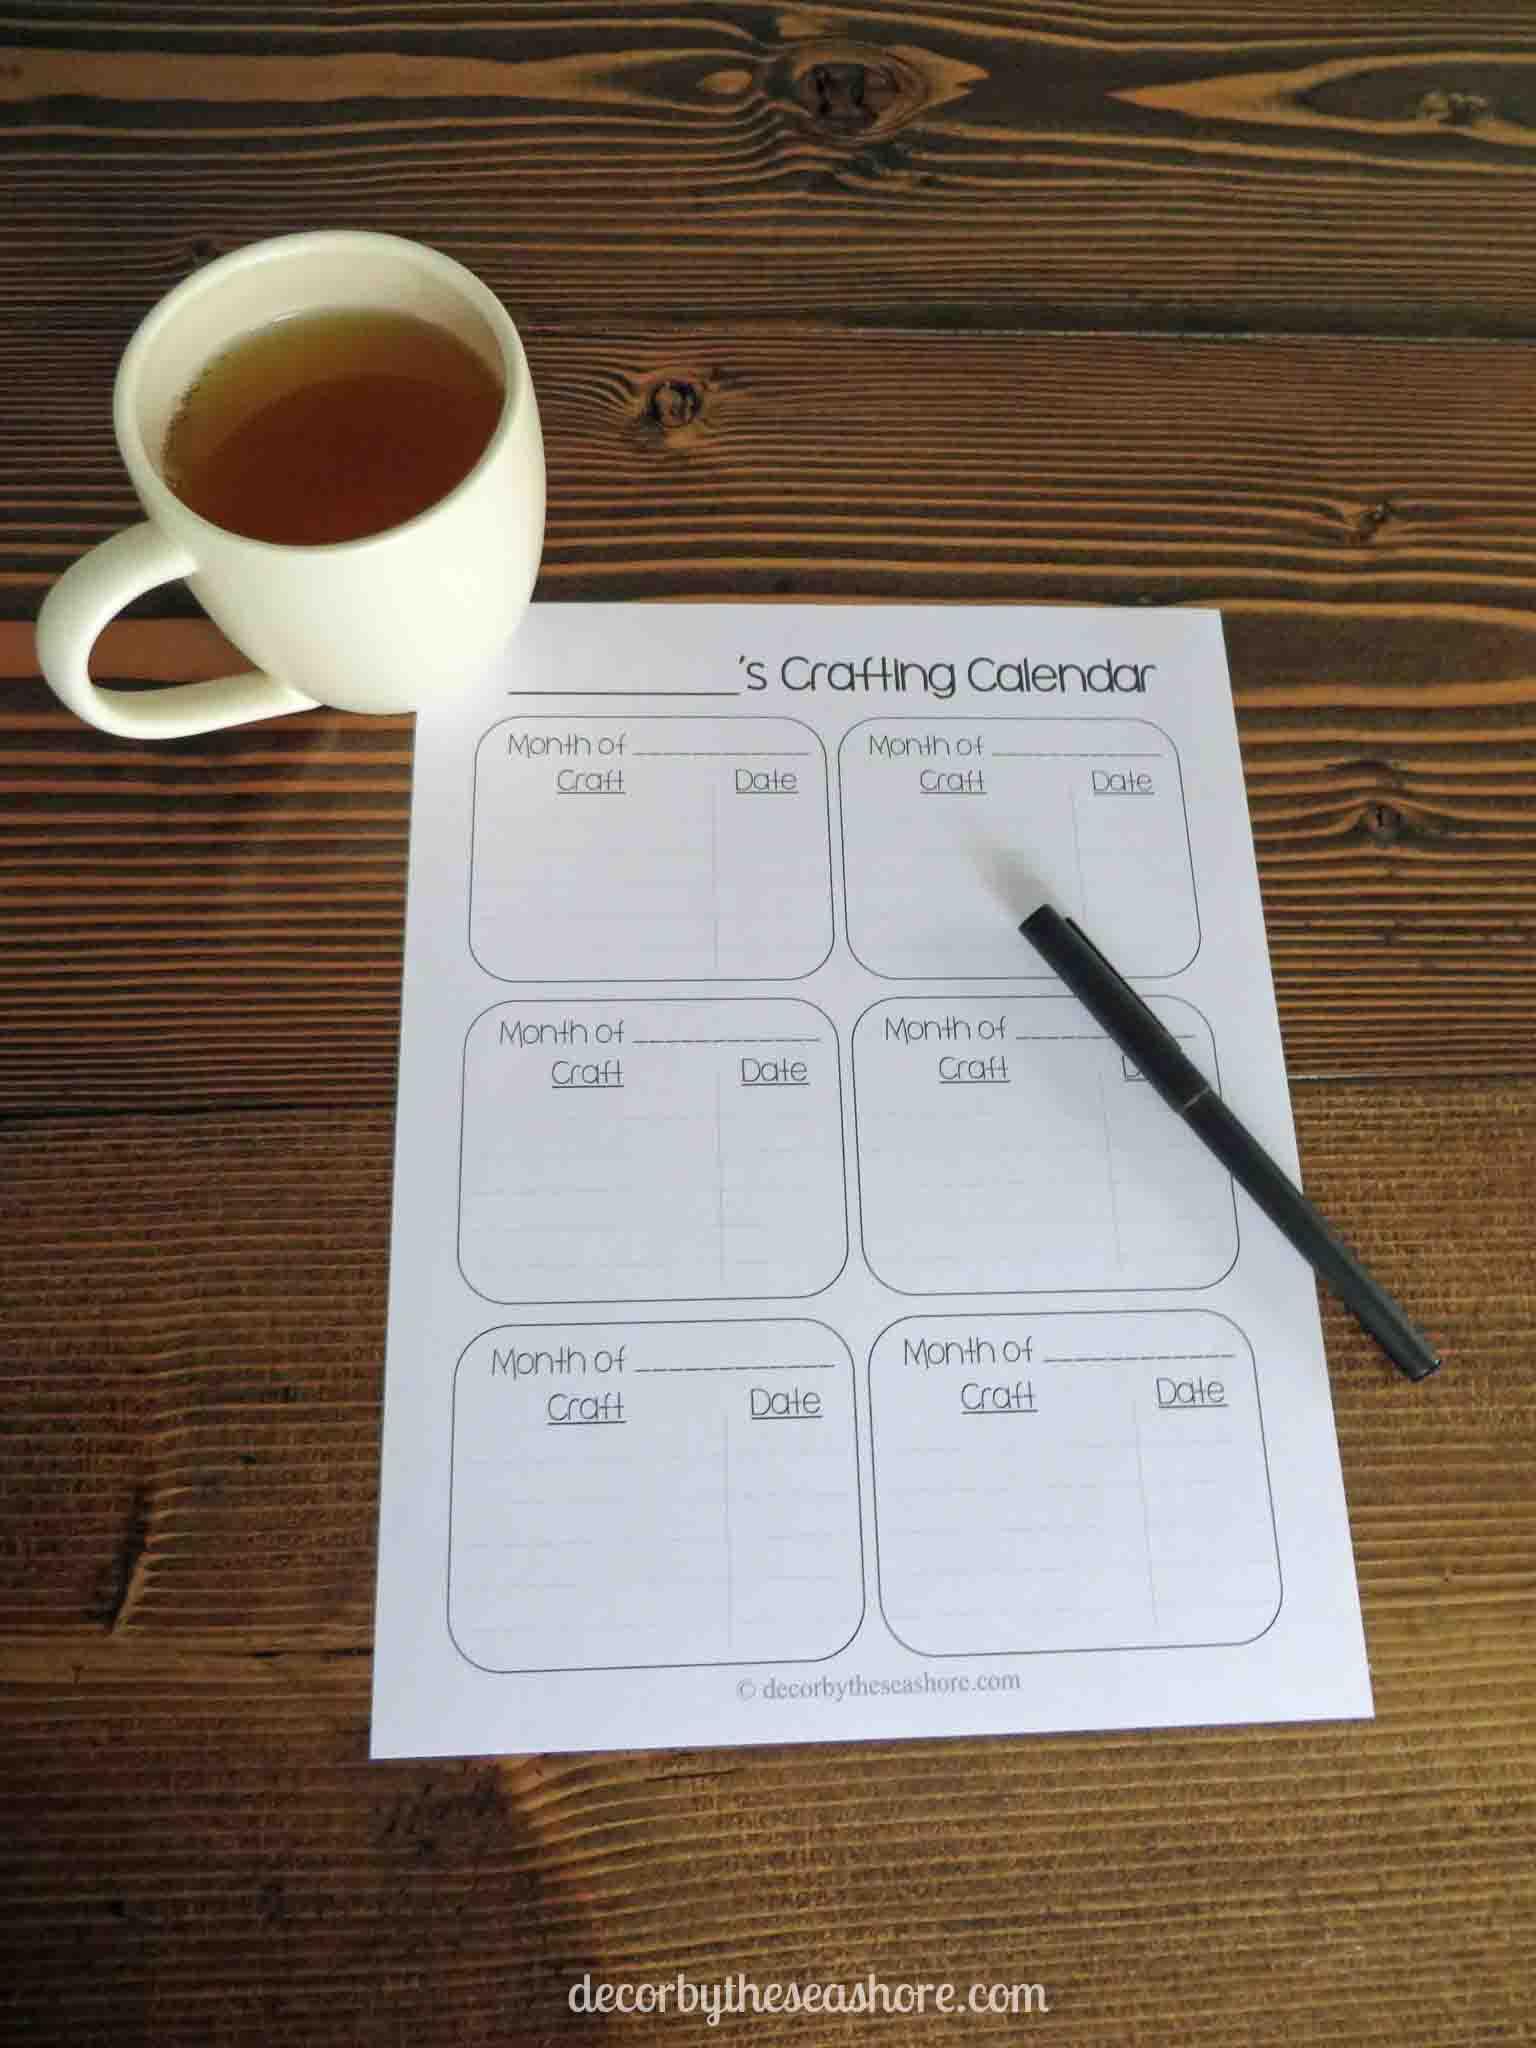 Crafting Calendar Free Printable Printed